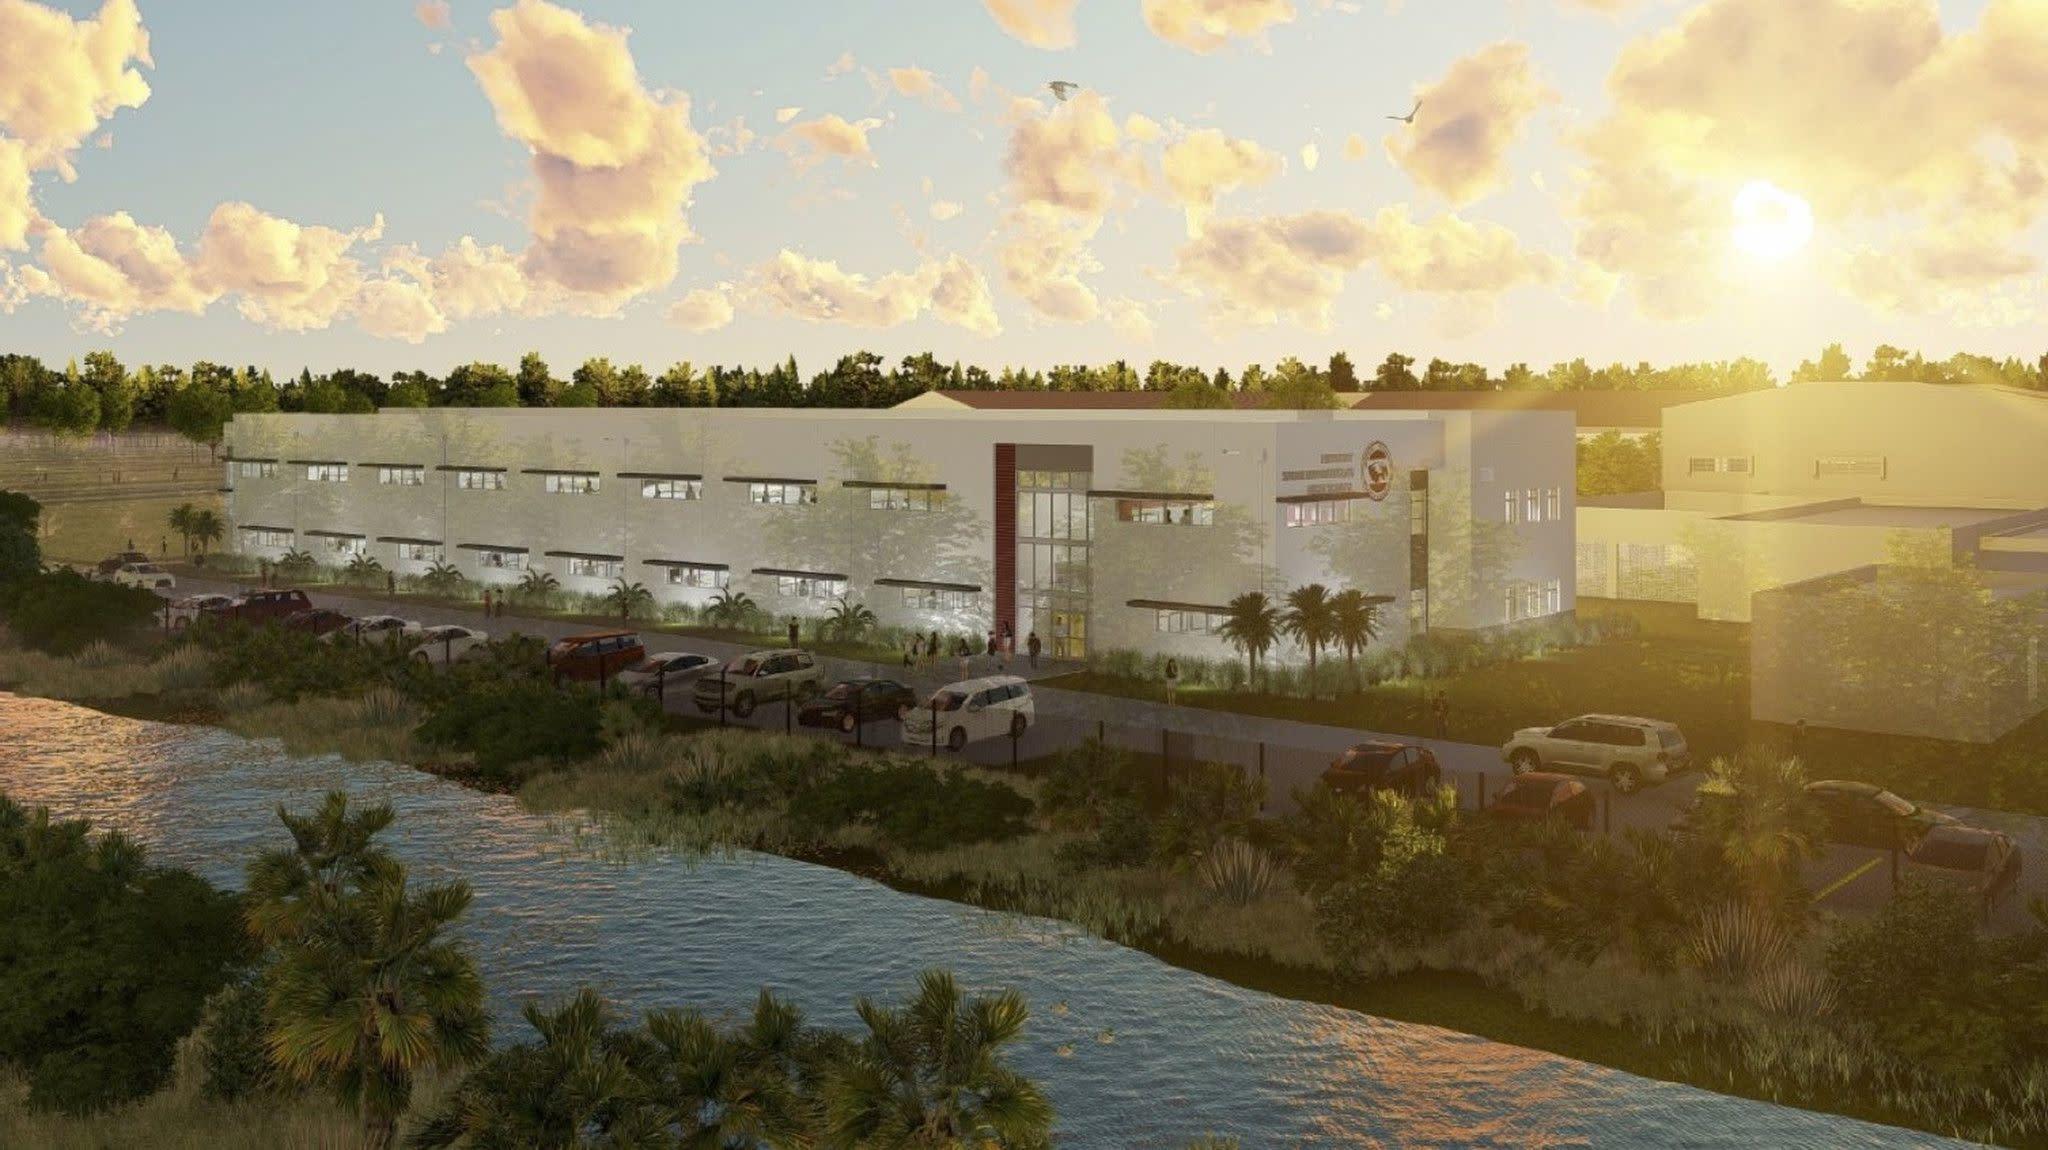 New freshman building unveiled at Marjory Stoneman Douglas High School